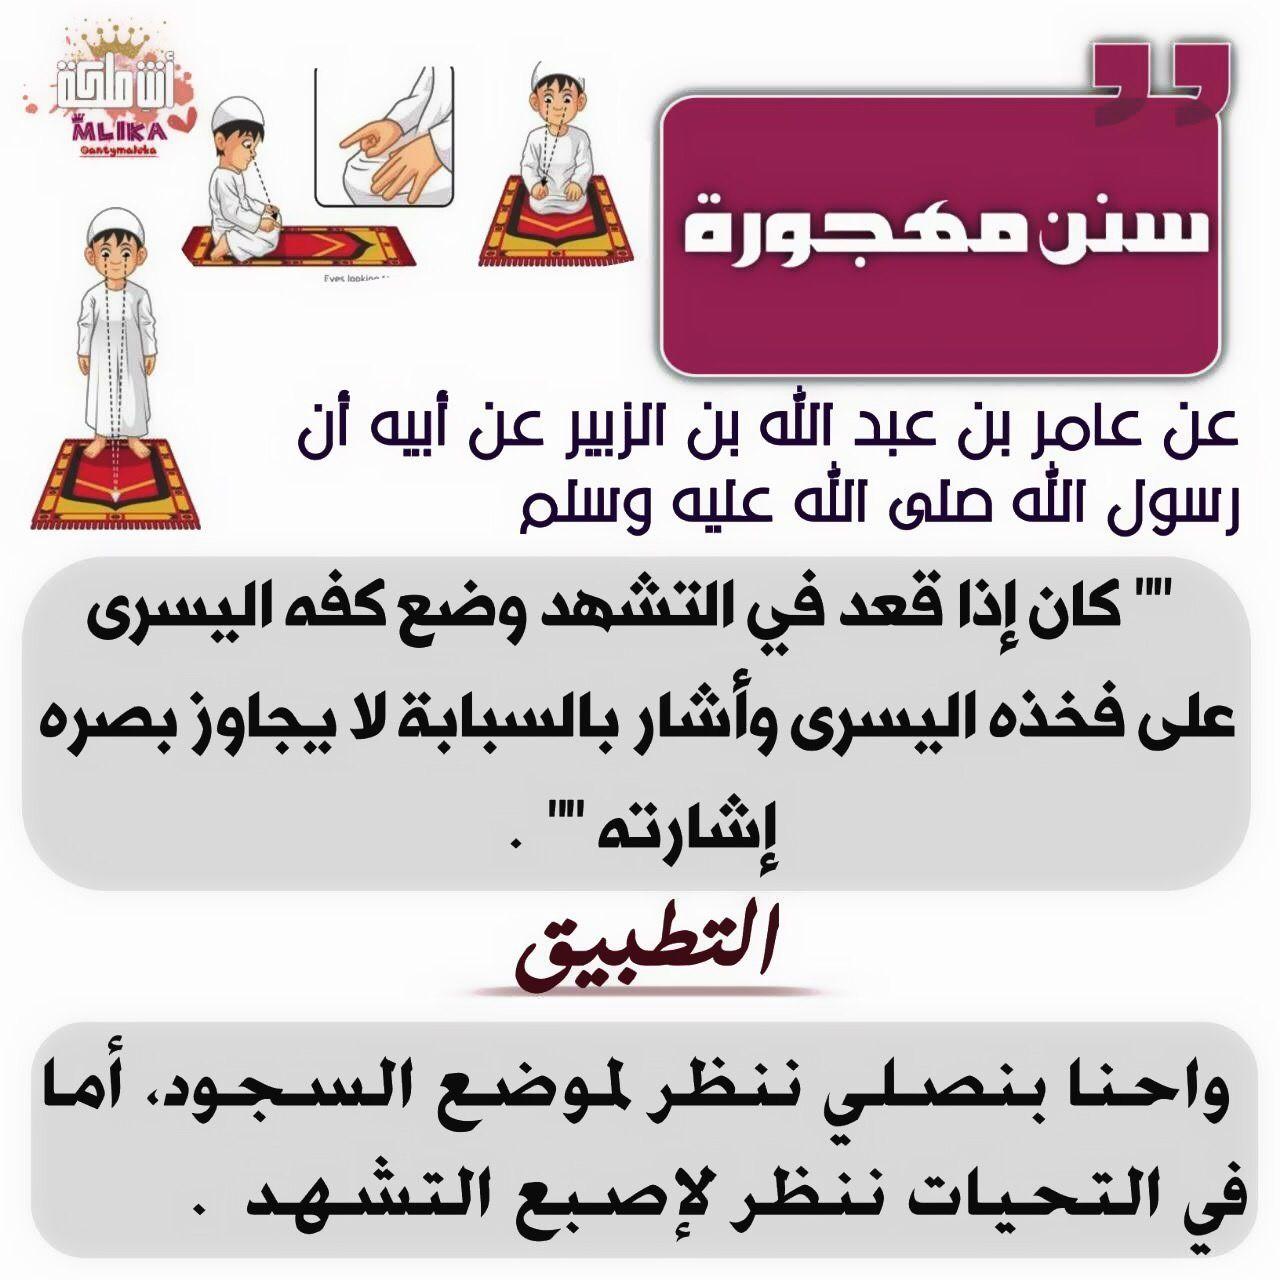 Pin By نشر الخير On أحاديث سيدنا محمد صلى الله عليه وسلم Islam Facts Peace Be Upon Him Islam